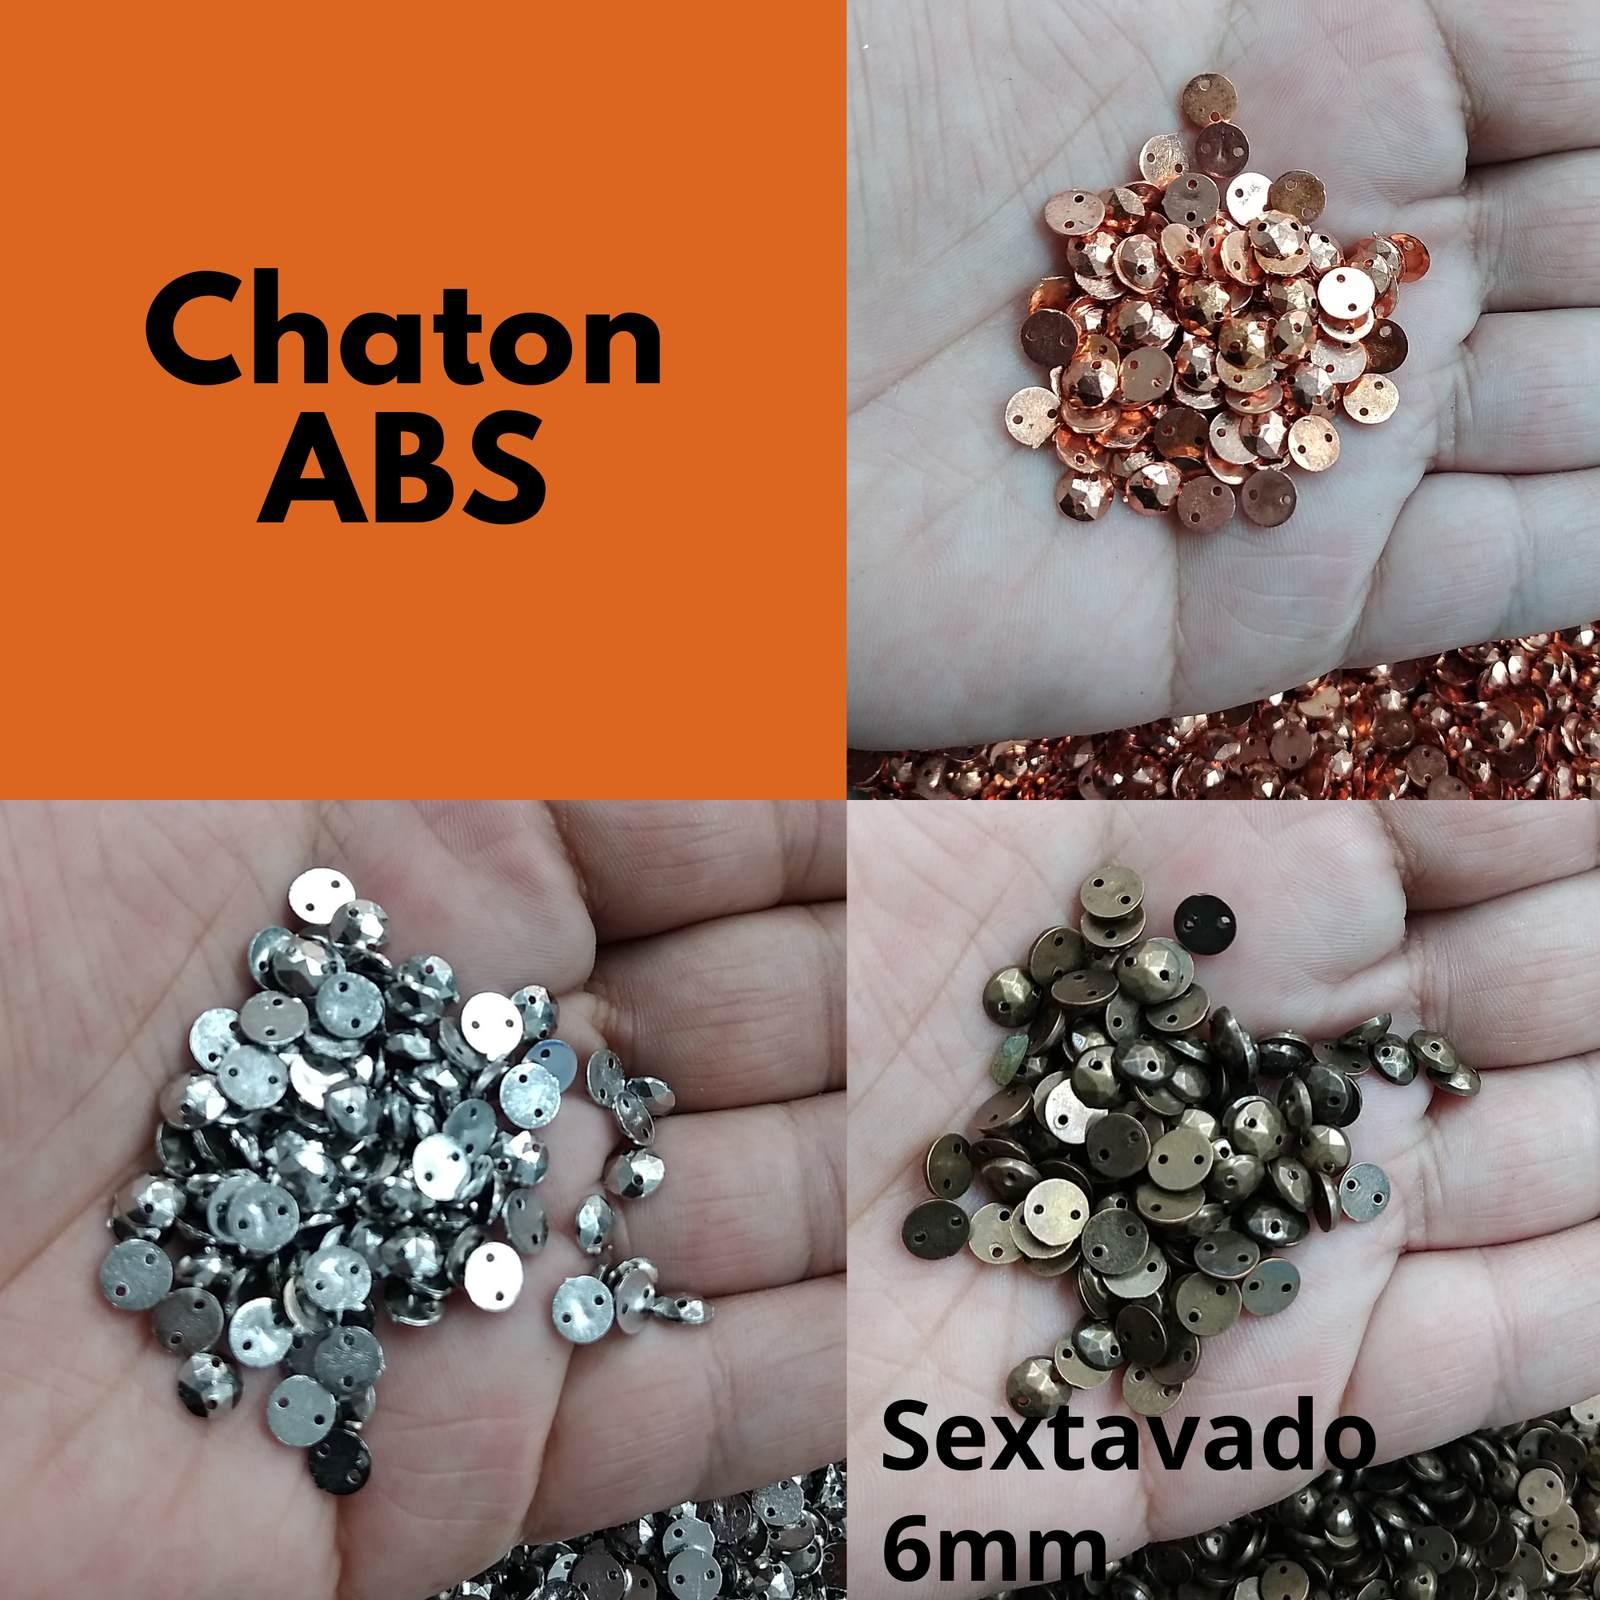 Chaton ABS  Redondo Sextavado 06mm - 250g